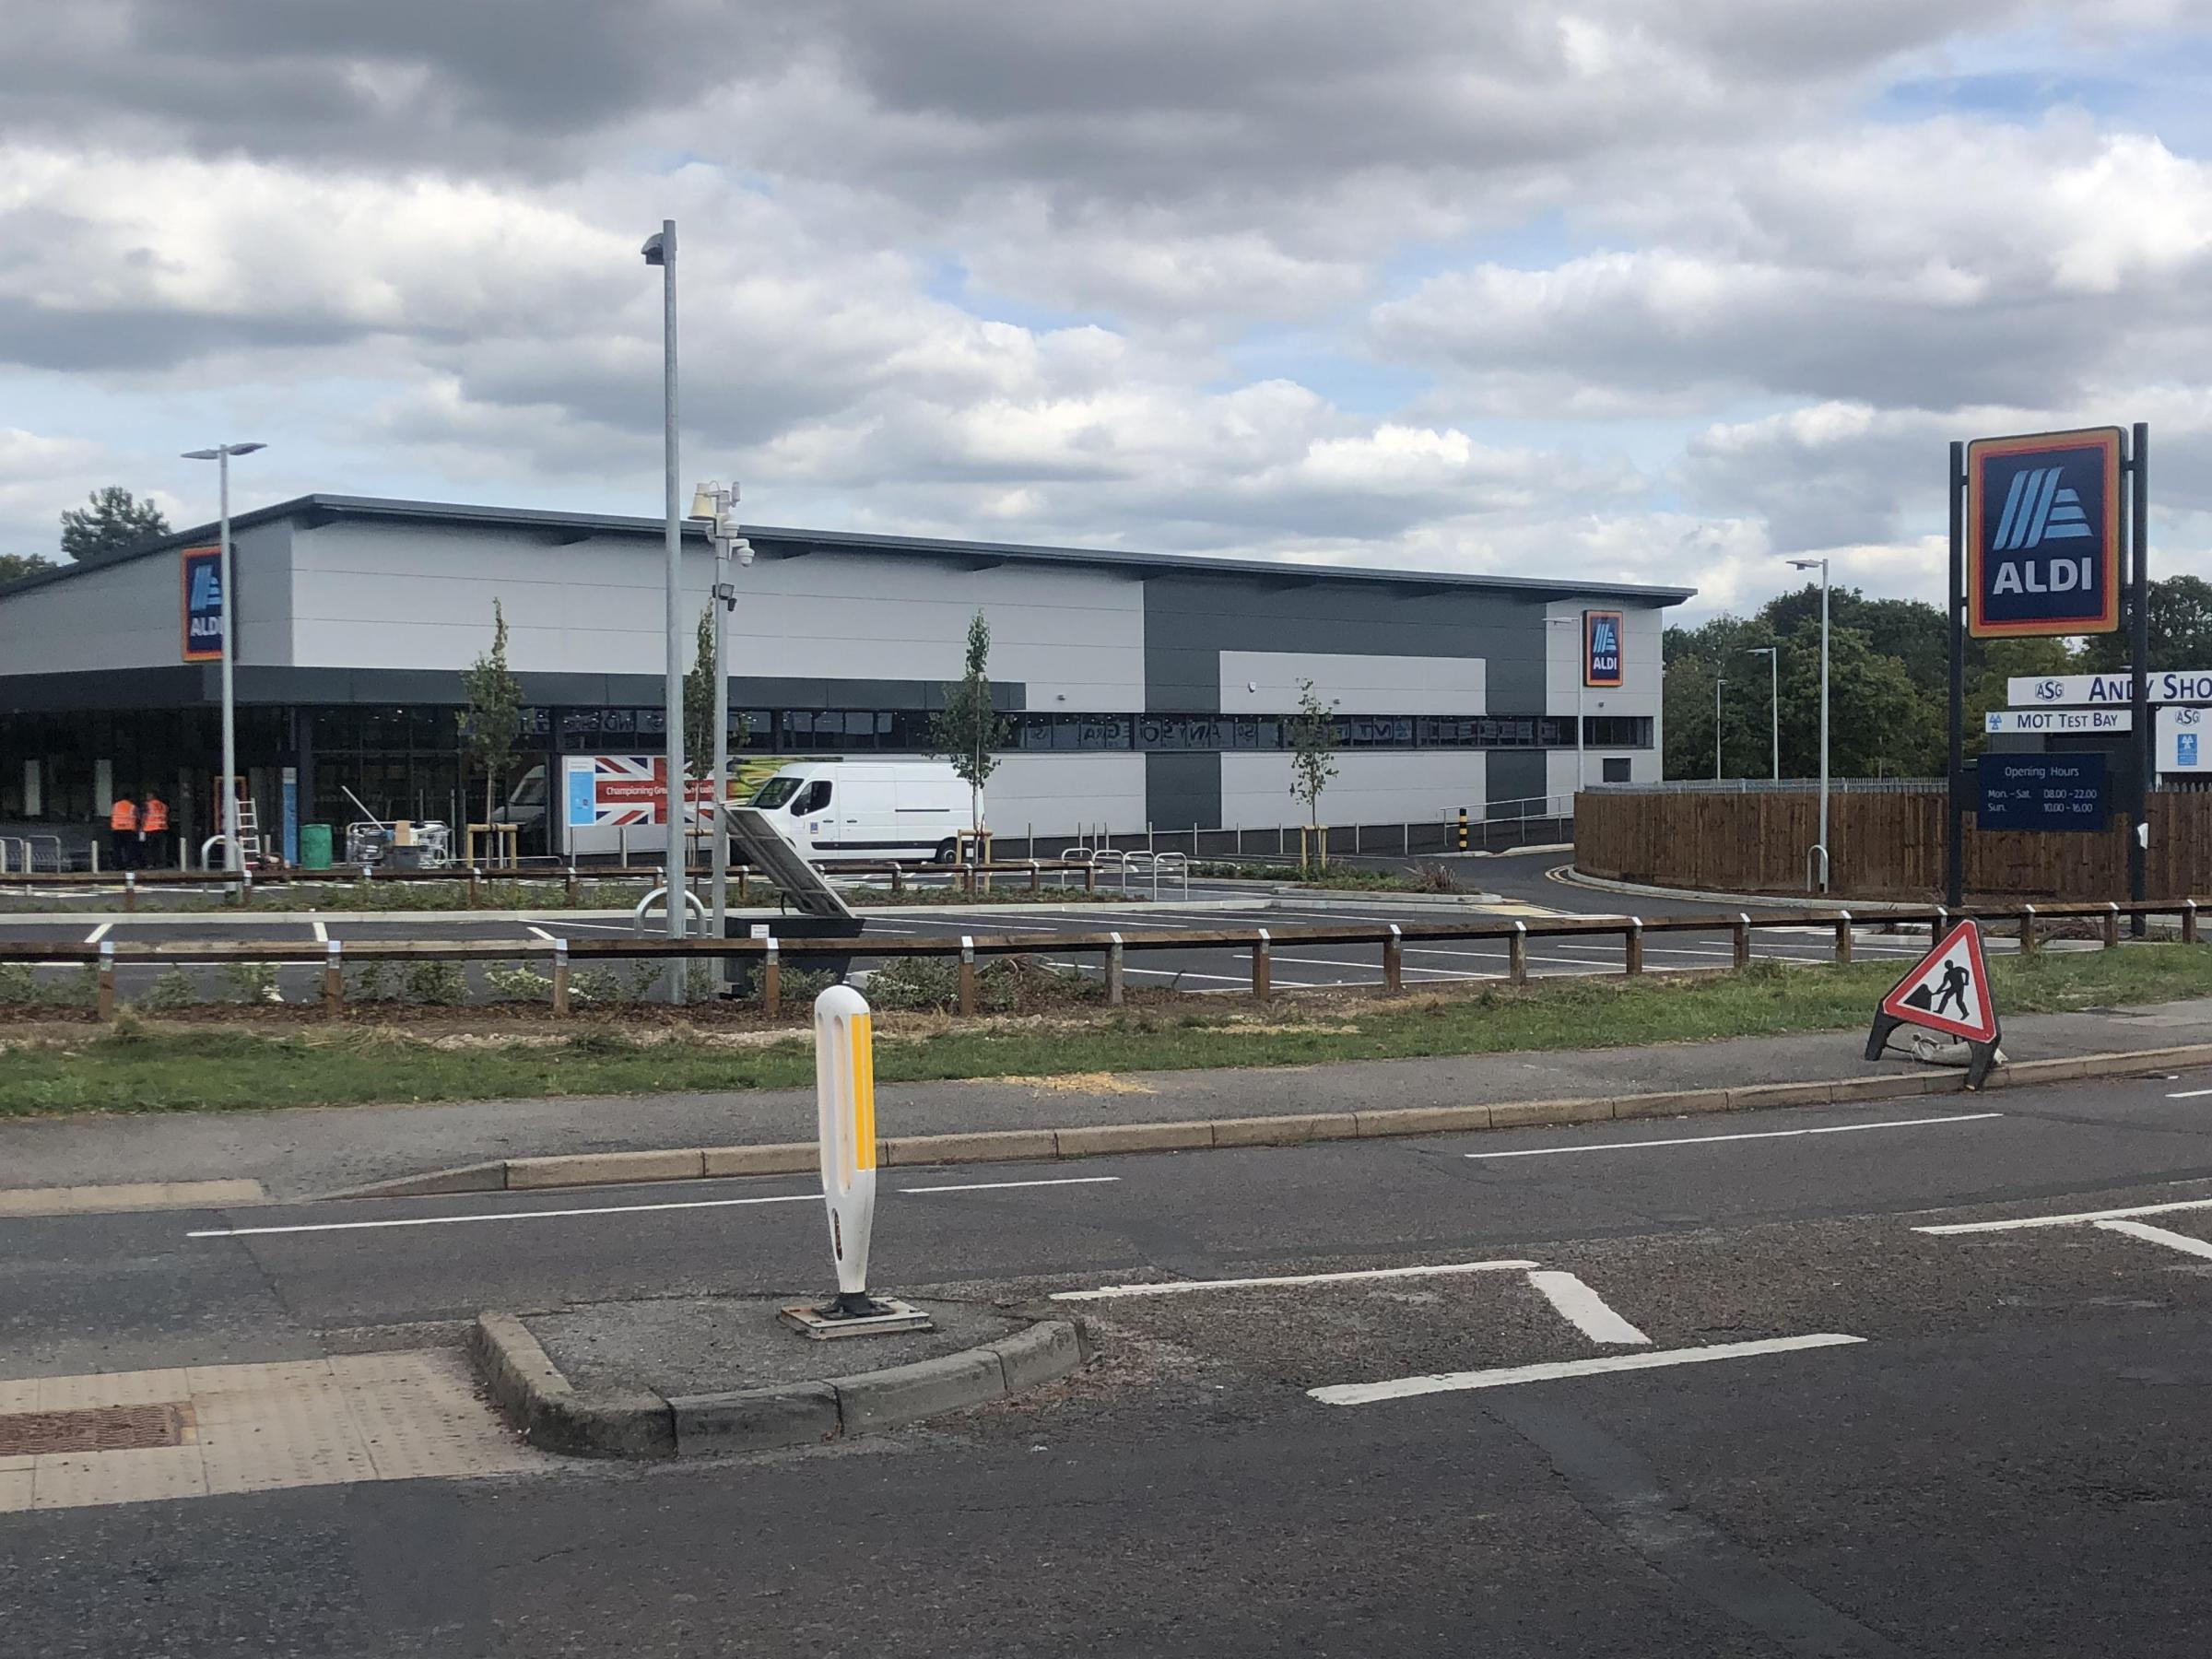 Winklebury Aldi opens its doors next week | Basingstoke Gazette